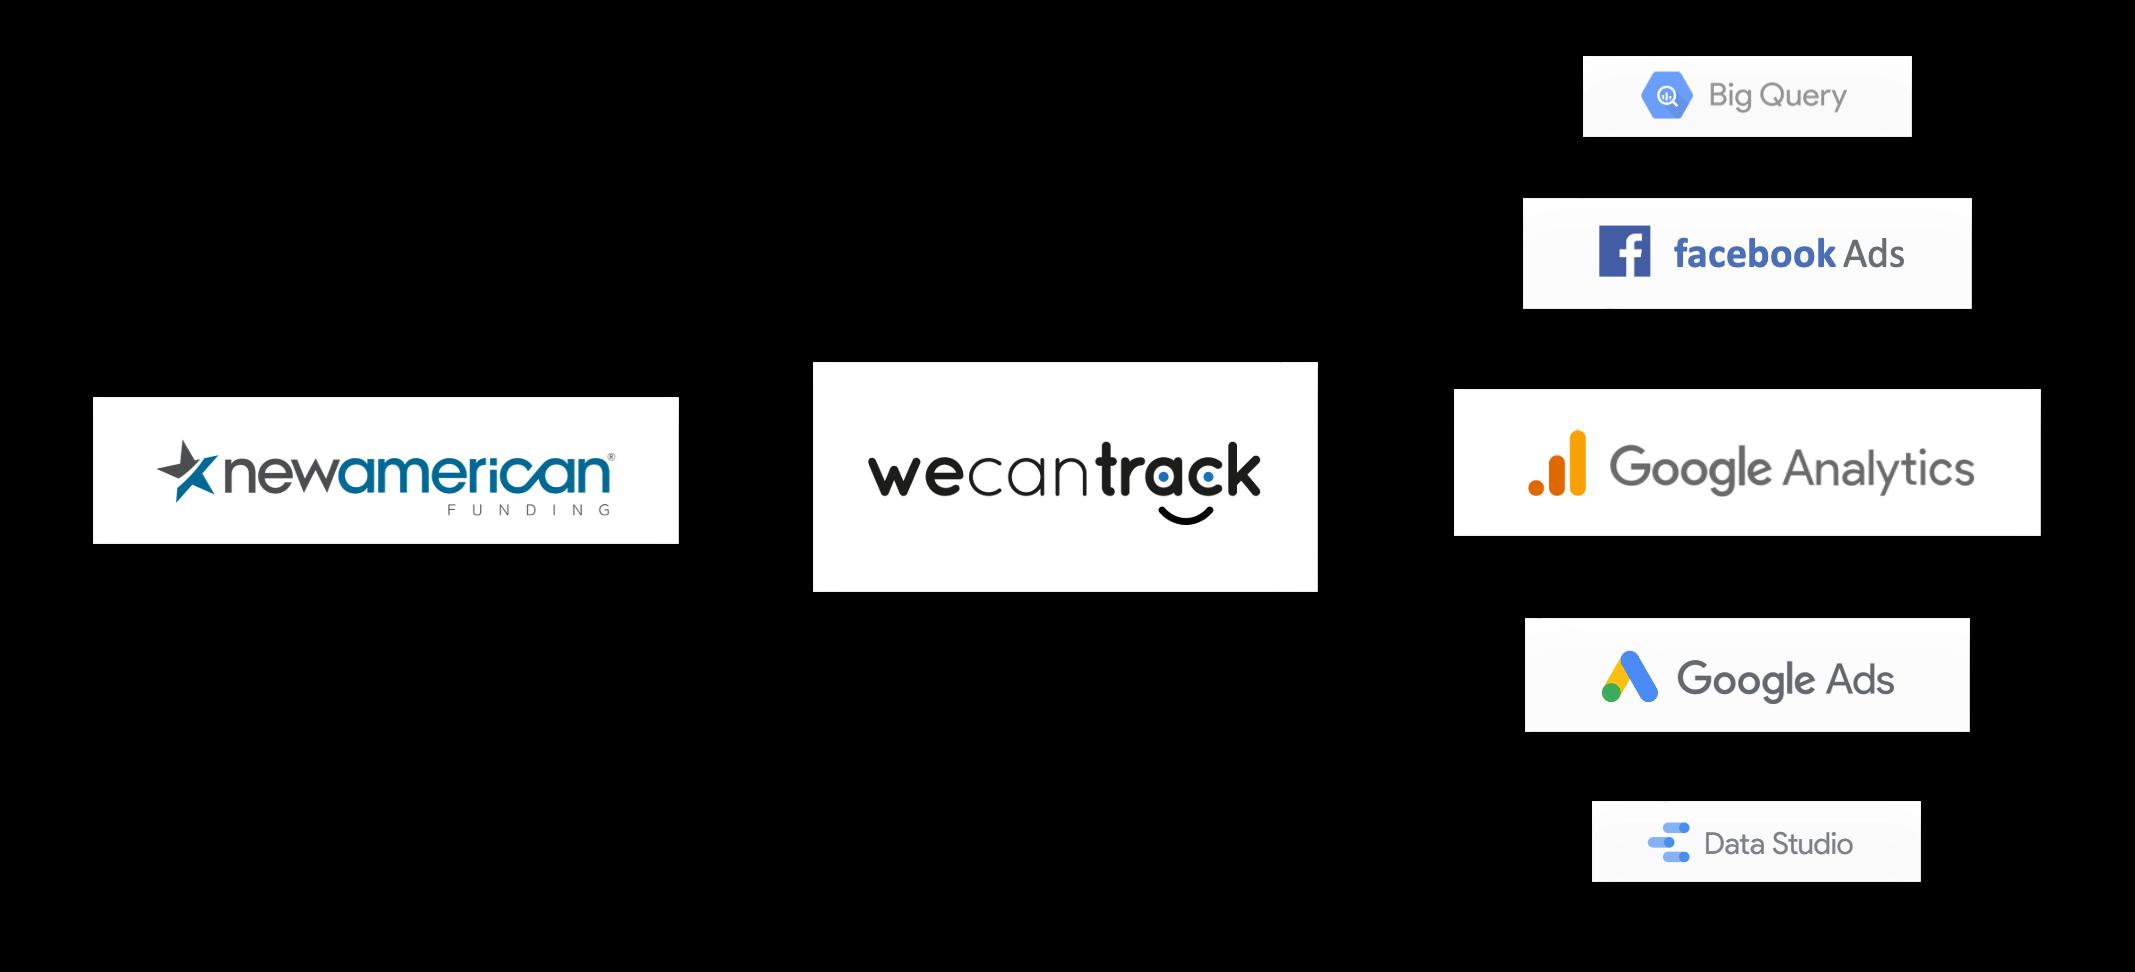 integrate-new-american-funding-affiliate-conversions-via-postback